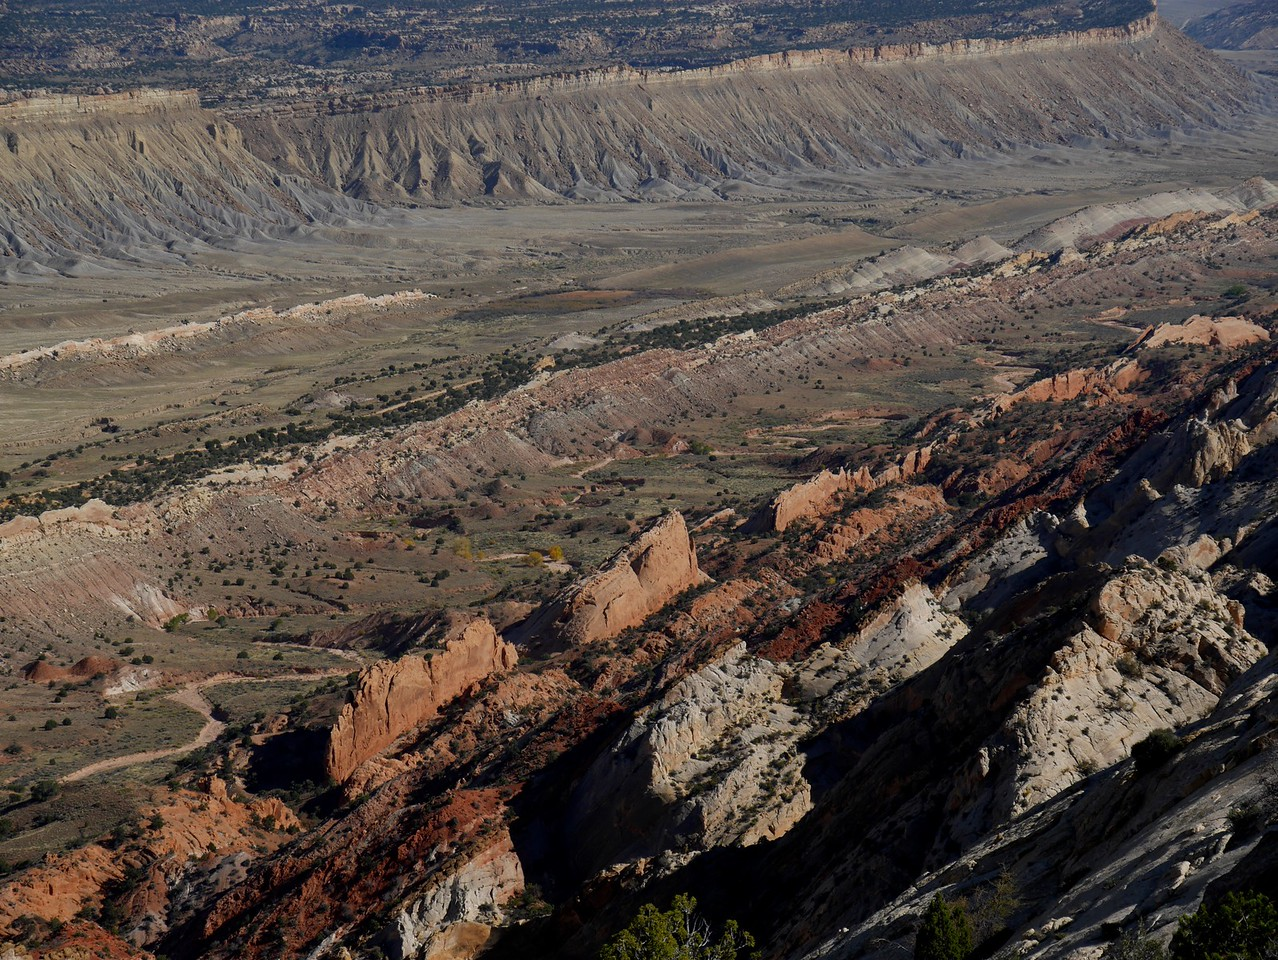 Upper Muley Twist hike - View from the ridge.